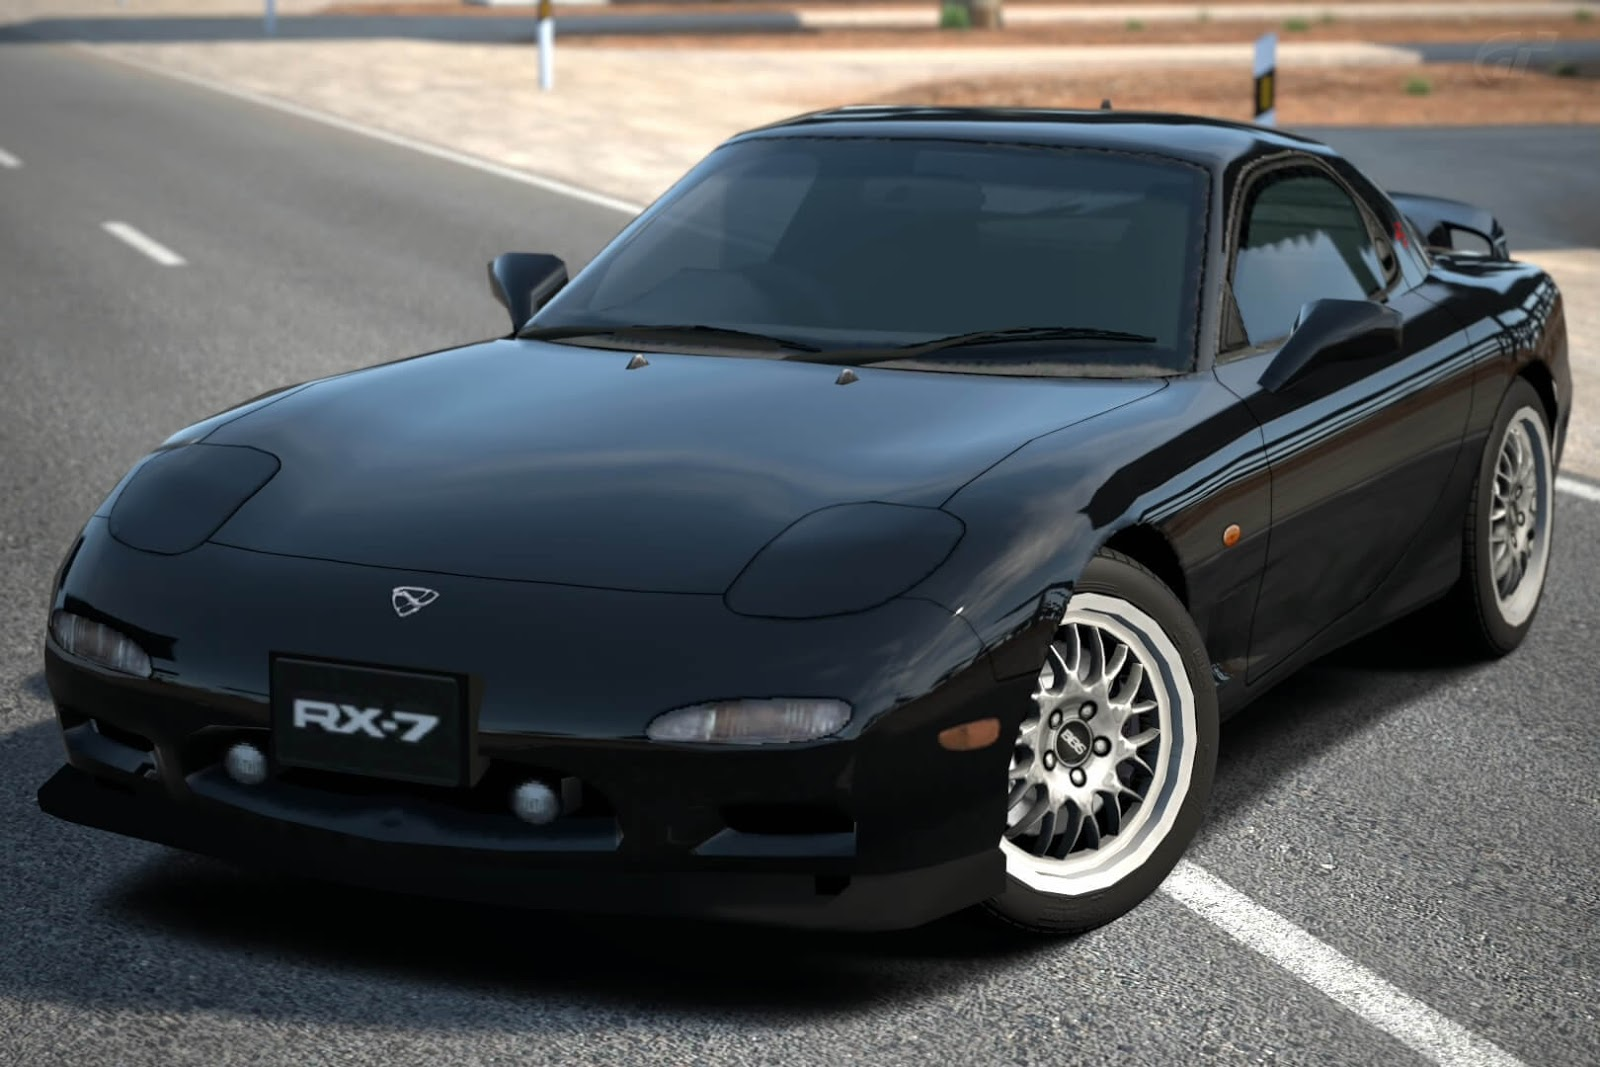 Mazda/Efini RX-7 Type R (FD3S)